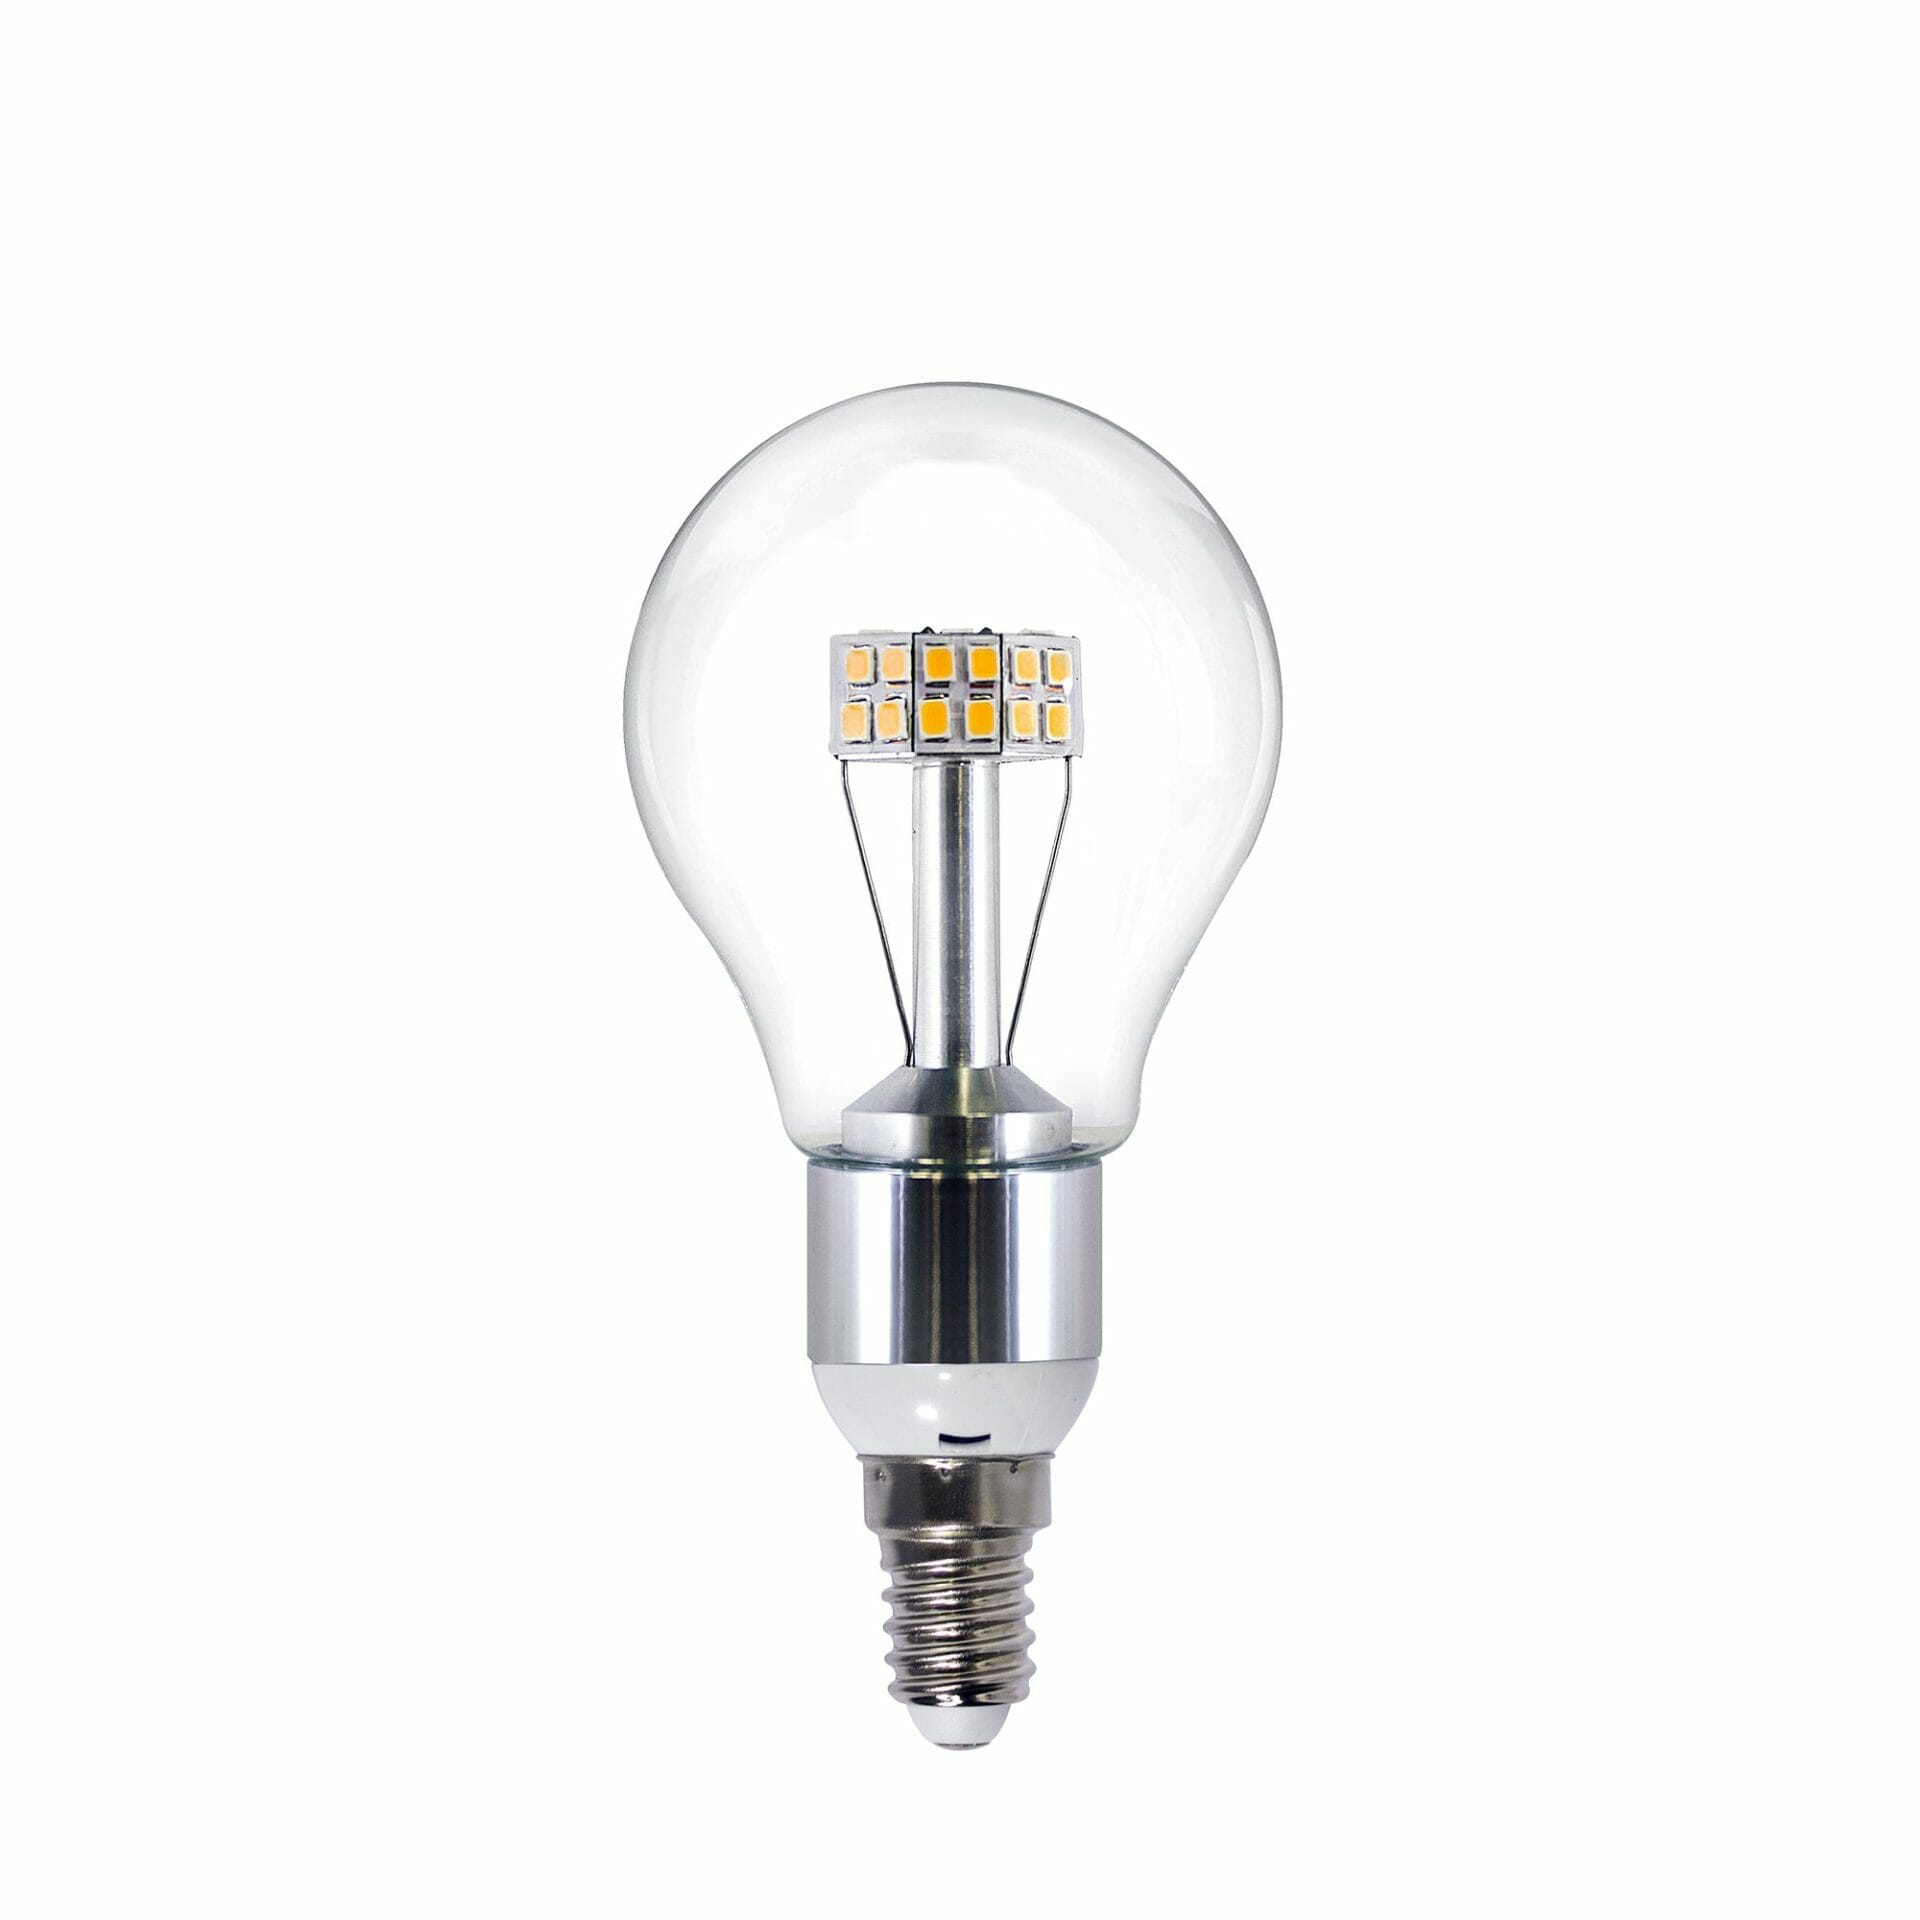 GS Solar LED Light Bulb A60 - 27 LED's